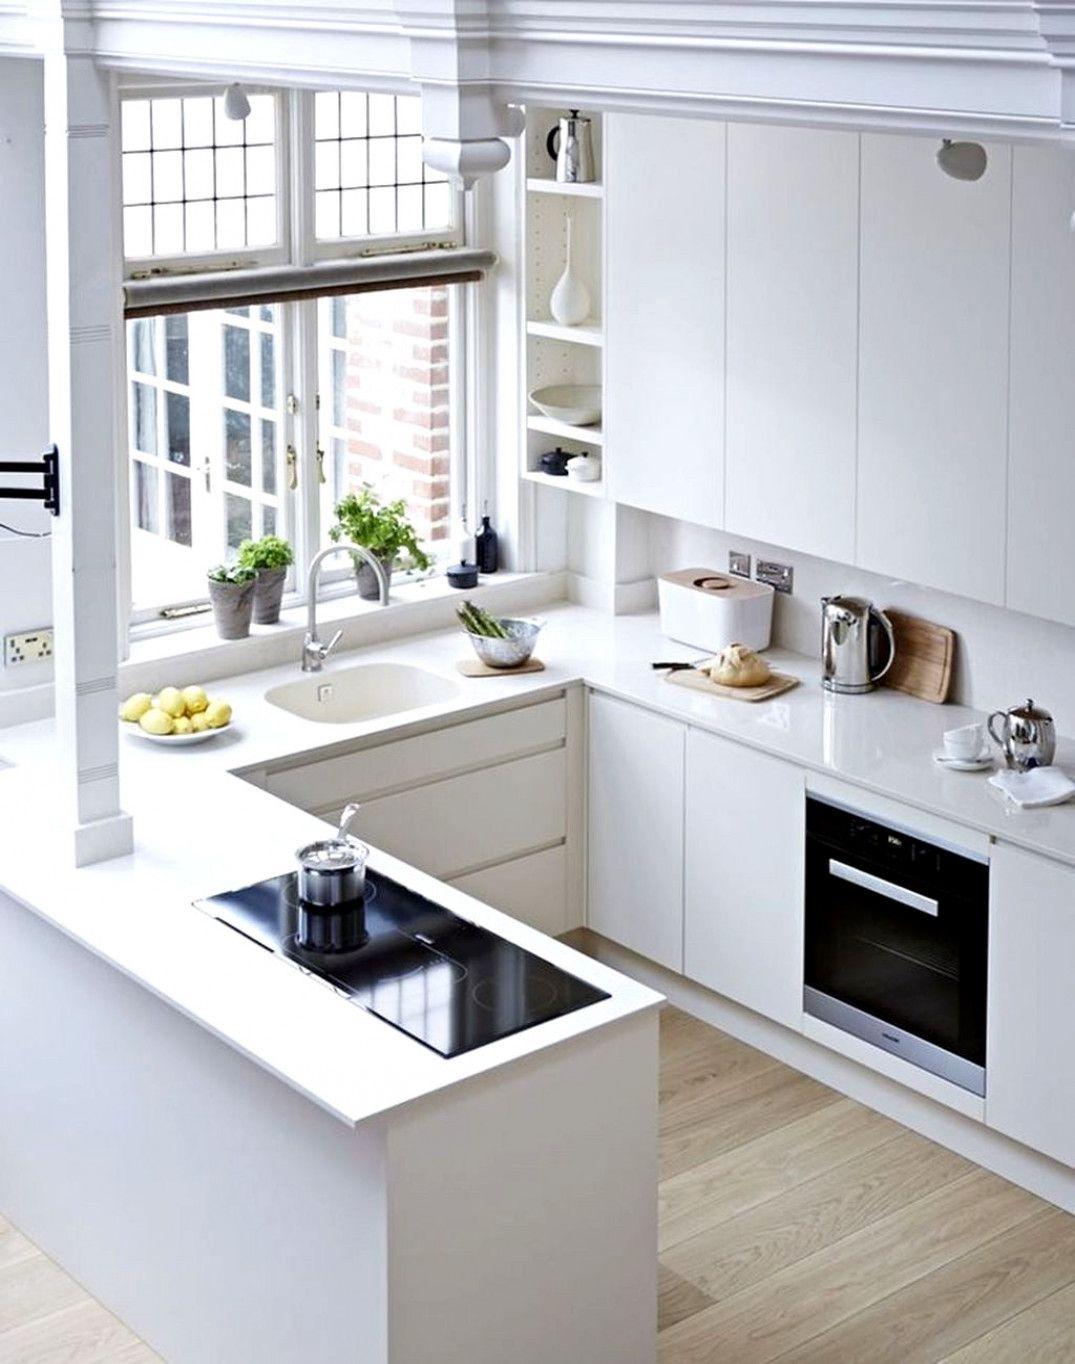 59bf472e4a01 Inspiring Small Modern Kitchen Design Ideas 17  KitchenCabinets. Visit.  January 2019